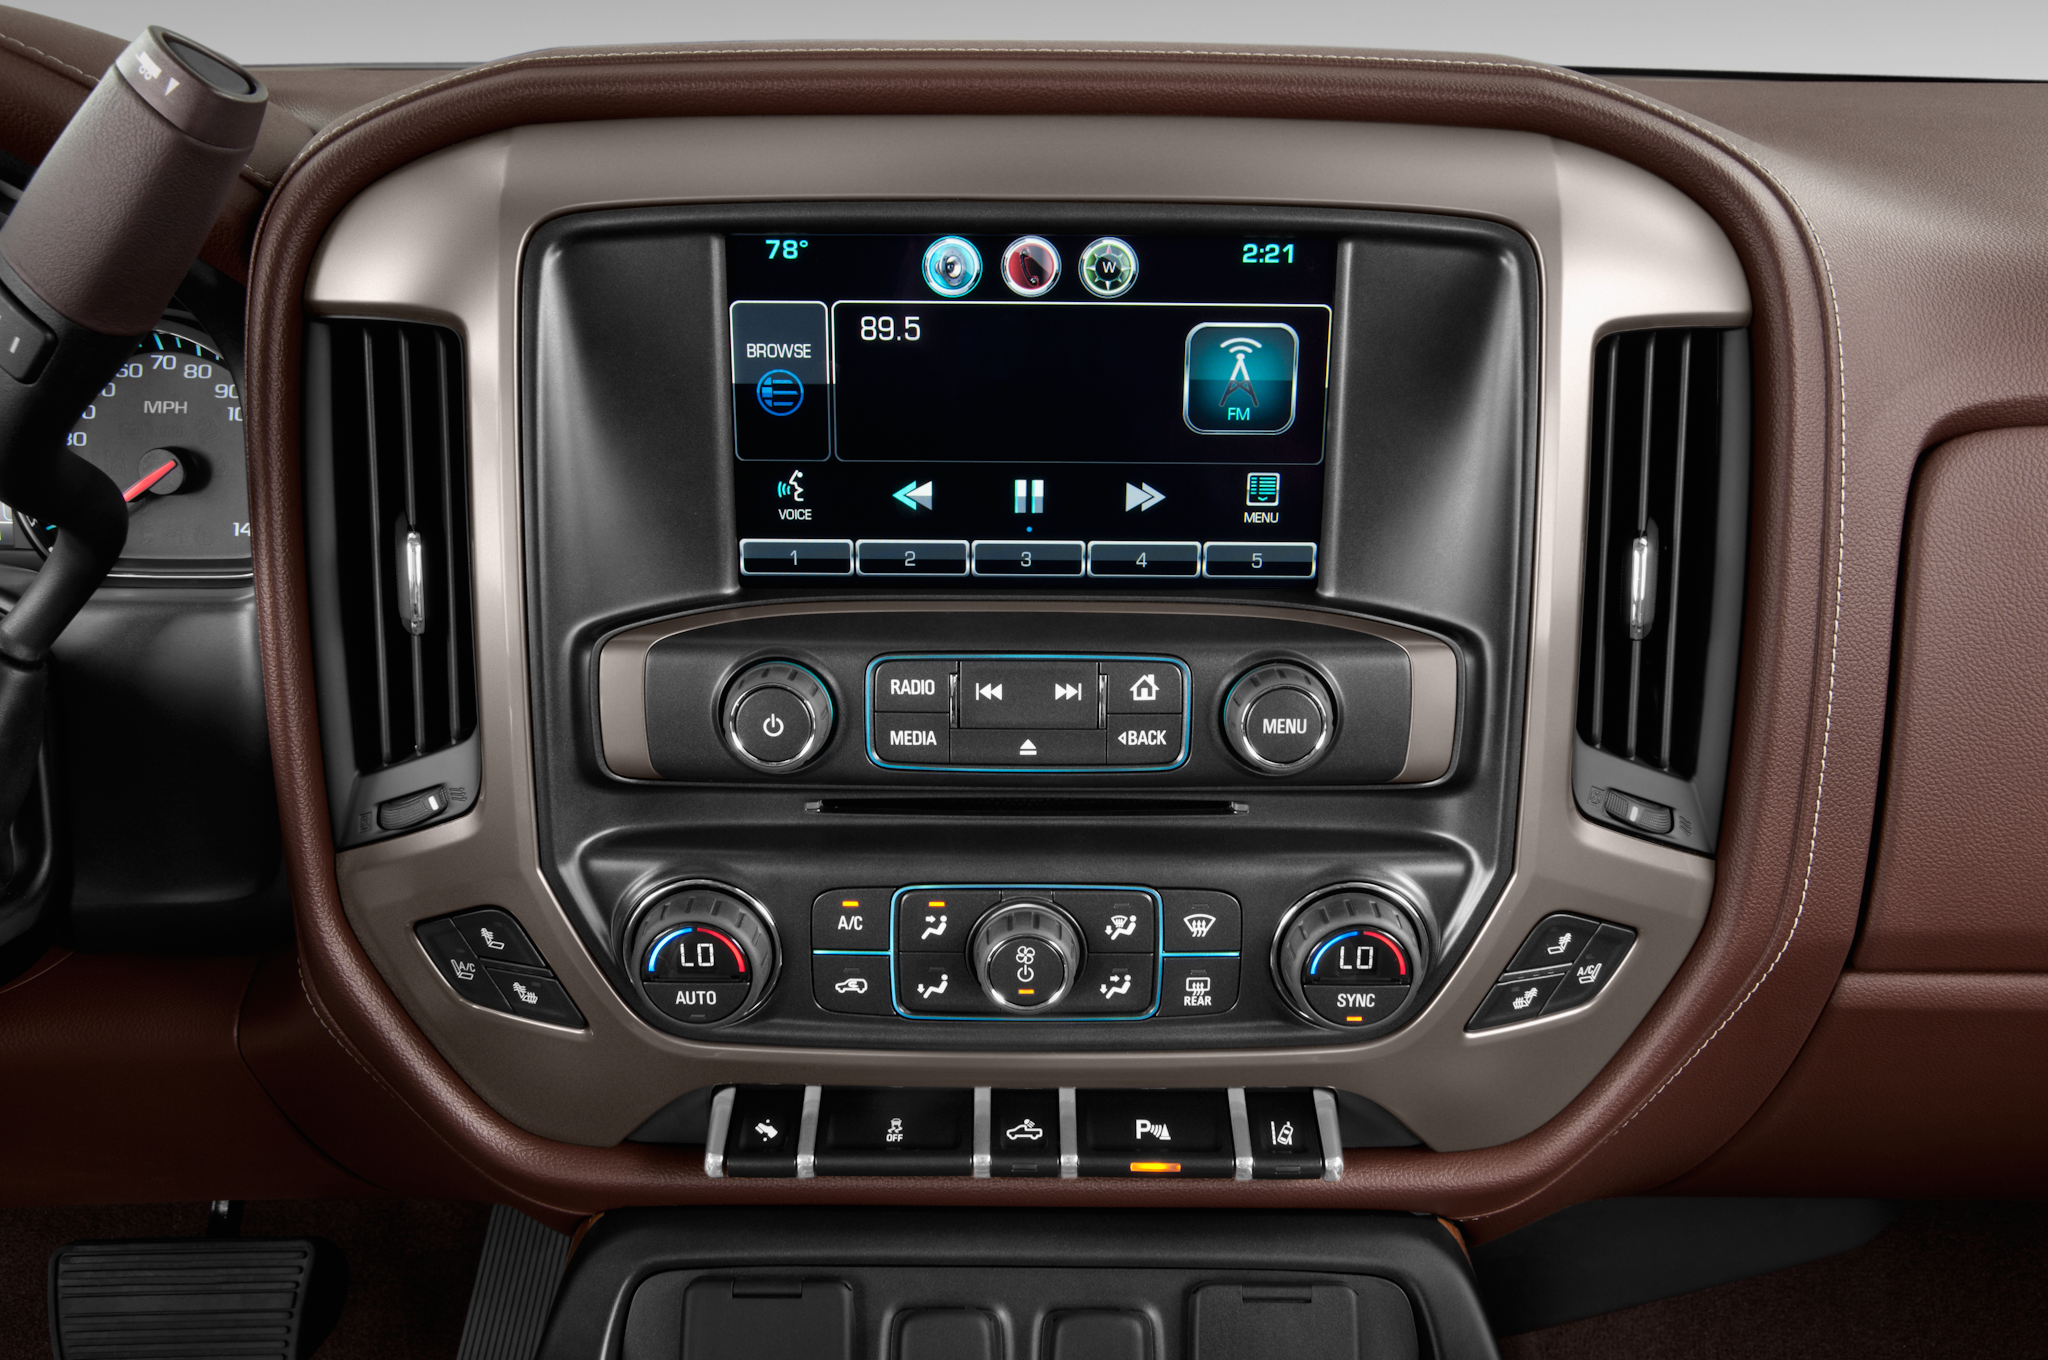 2016 Chevrolet Silverado Gmc Sierra Add Eassist Hybrid Automobile 2015 Chevy High Country 73 125